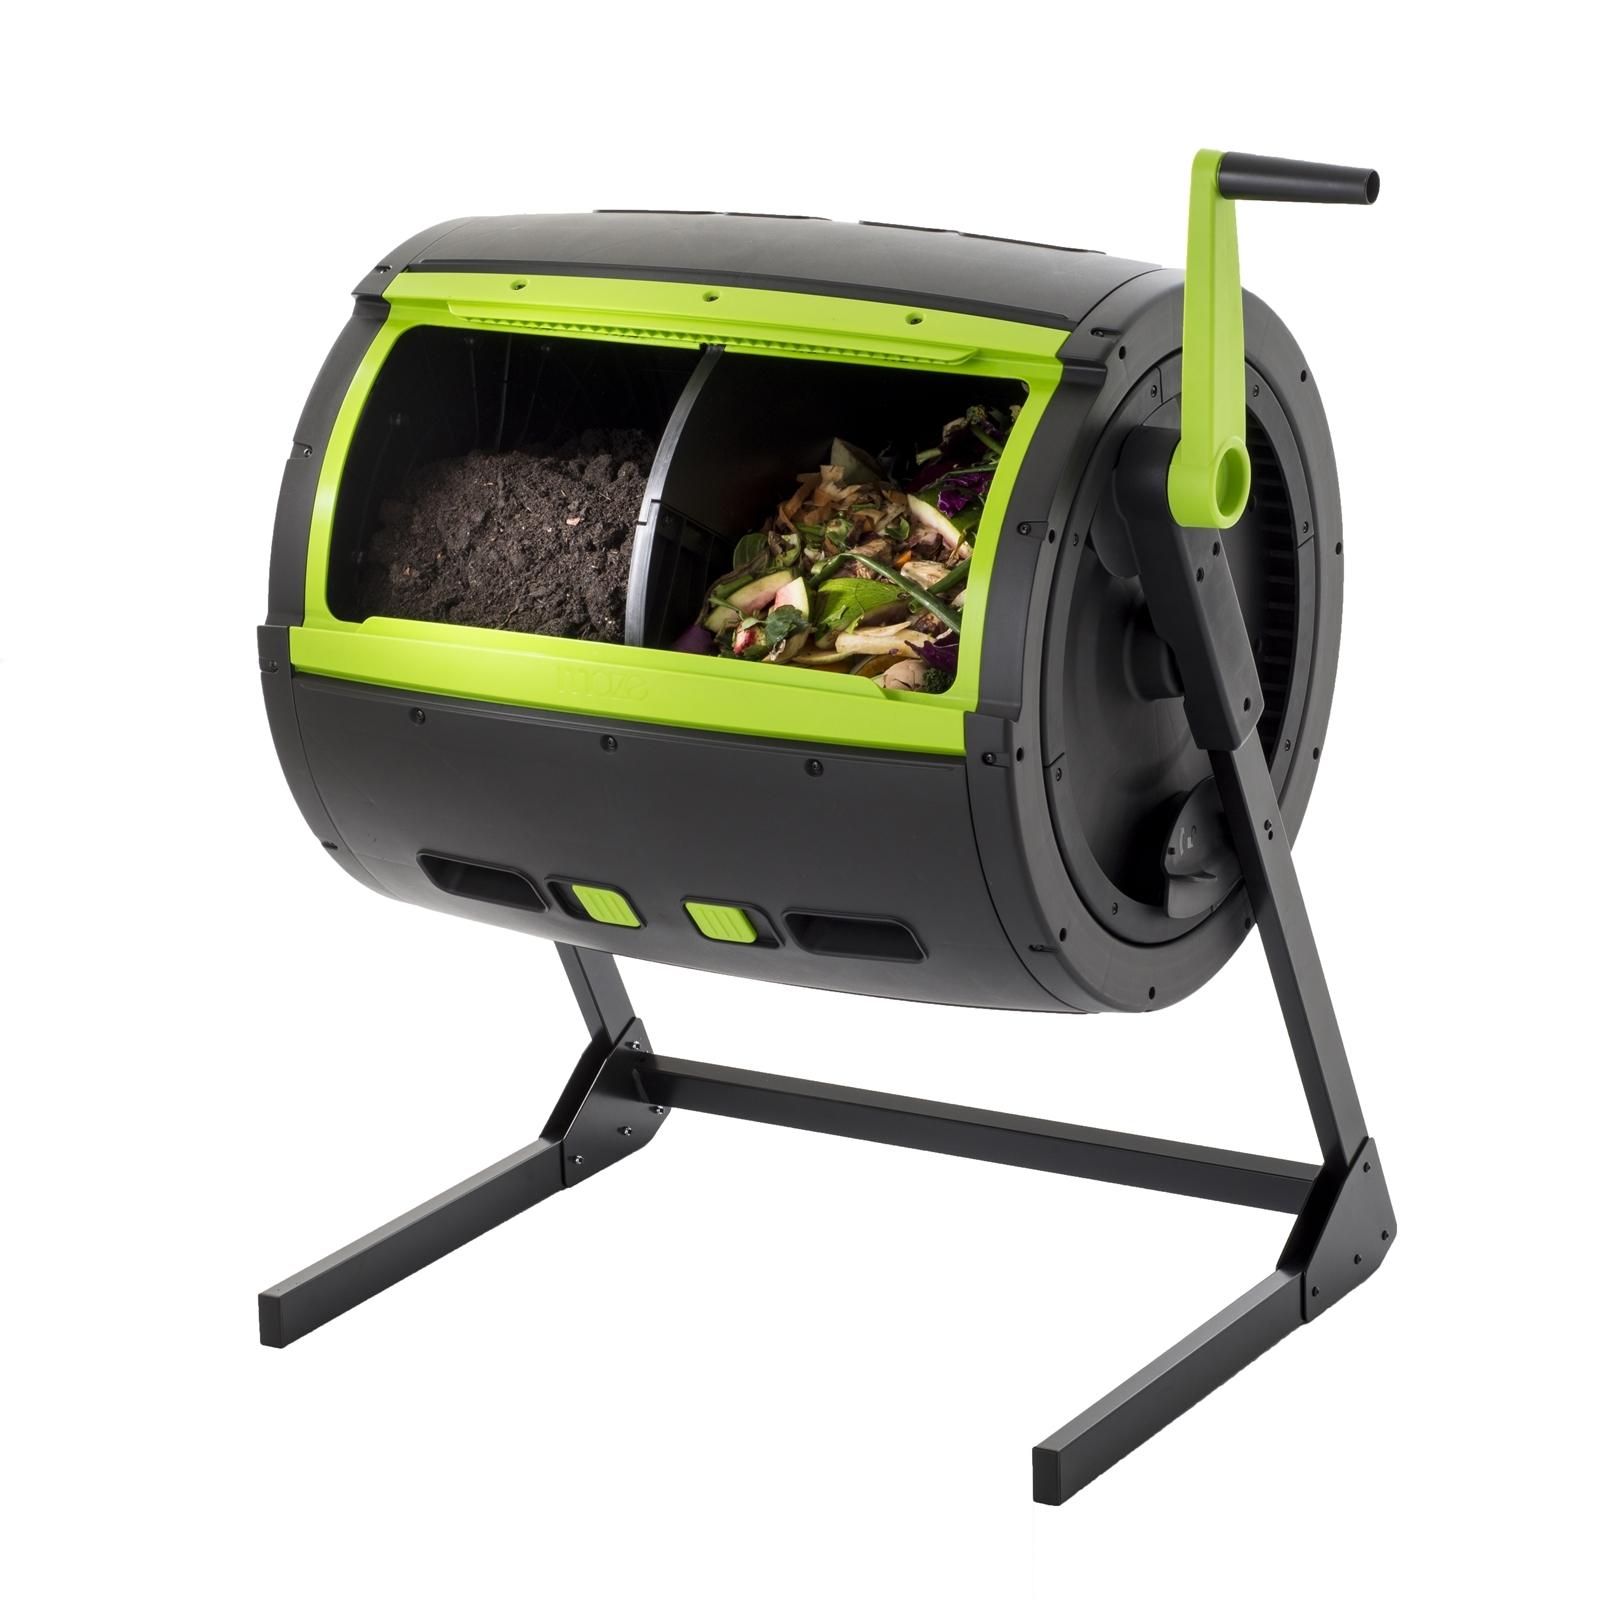 Maze 245L 2 Compartment Compost Tumbler